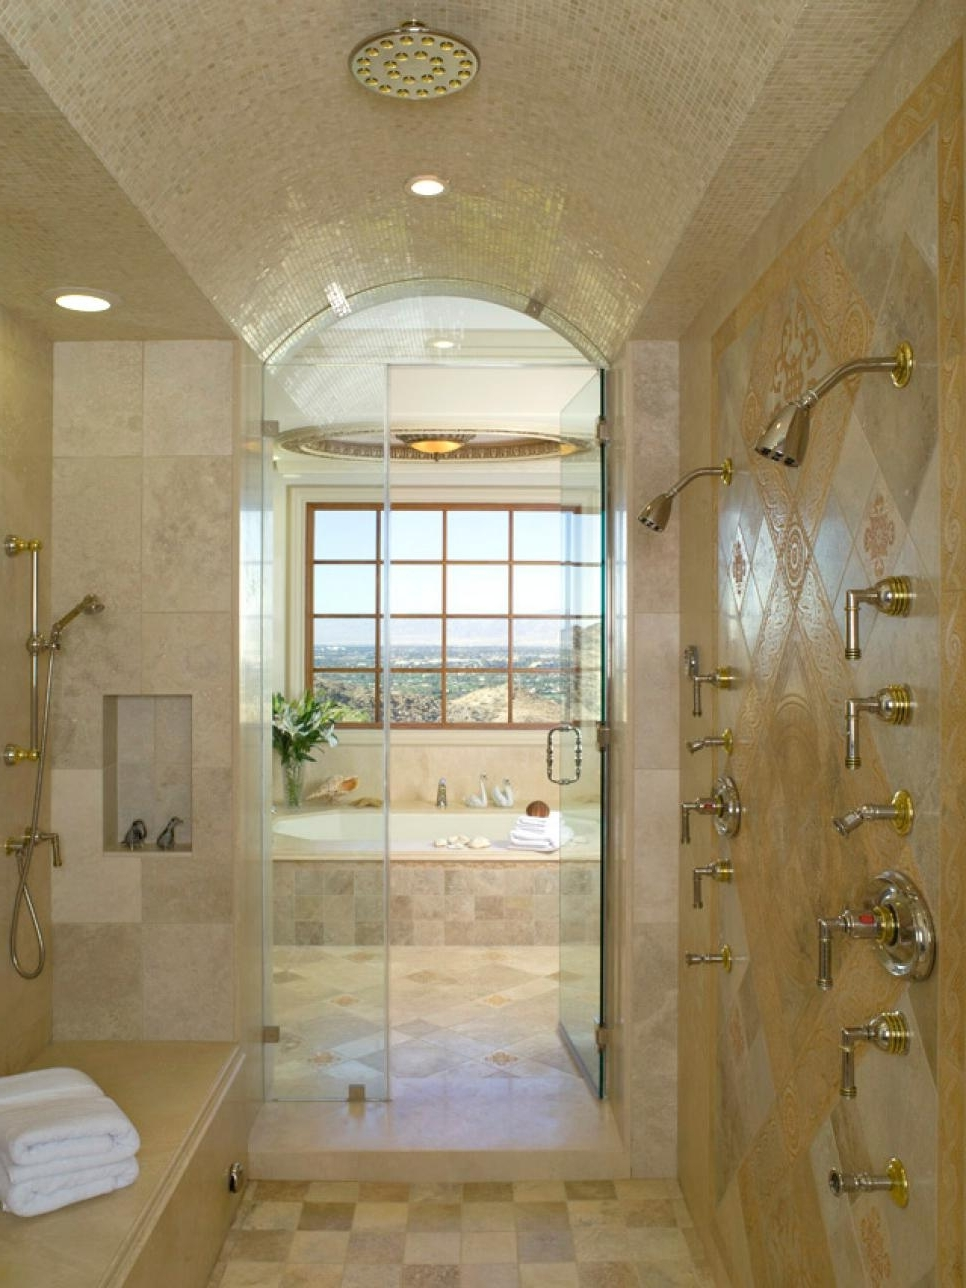 10 Best Bathroom Remodeling Trends | Bath Crashers | Diy Pertaining To Bathroom Remodel (View 27 of 33)